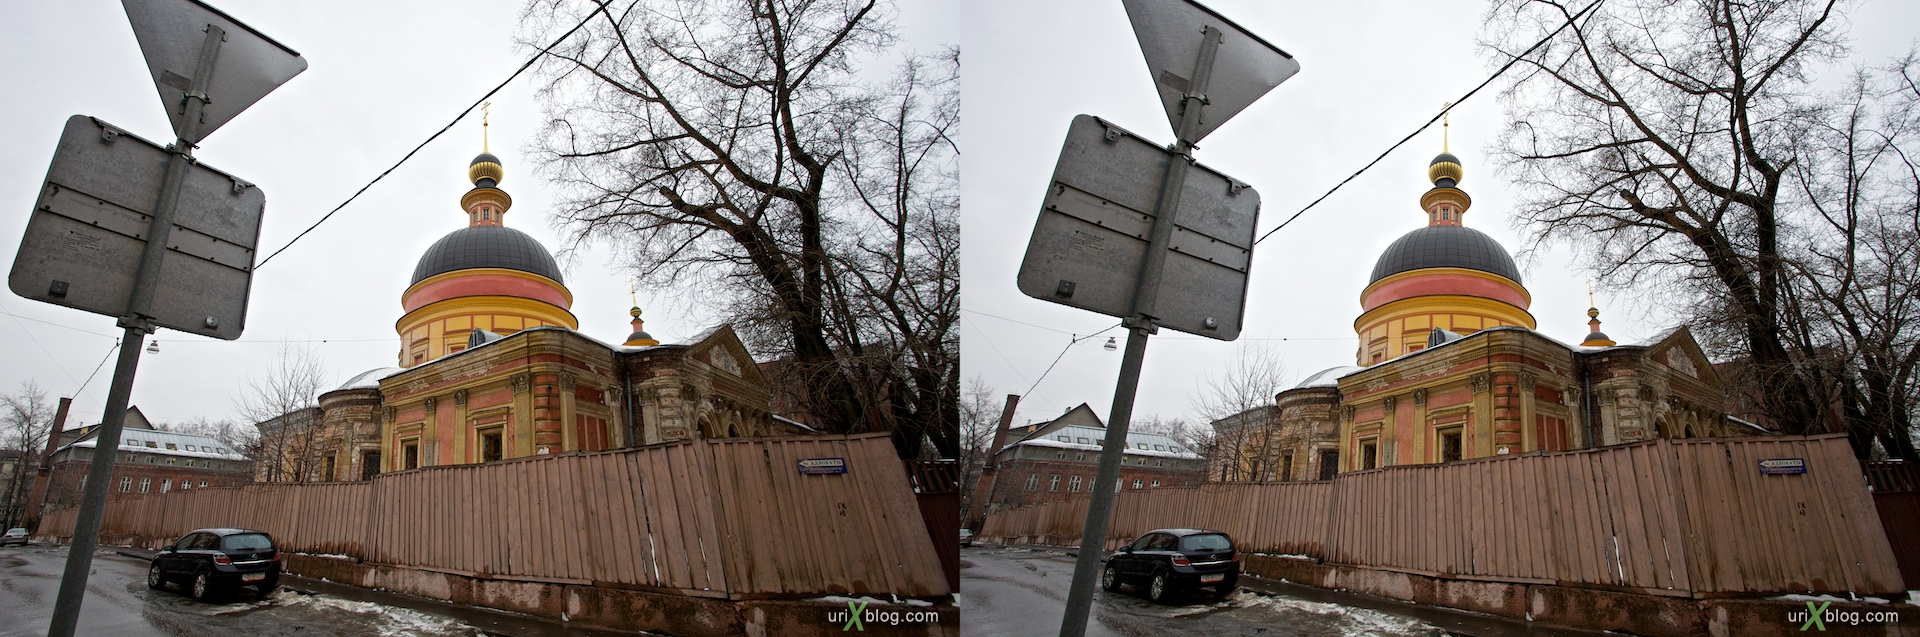 Moscow, near the Baumanskaya metro station, 2010 3D, stereo, cross-eyed, стерео, стереопара, Москва, около Бауманской